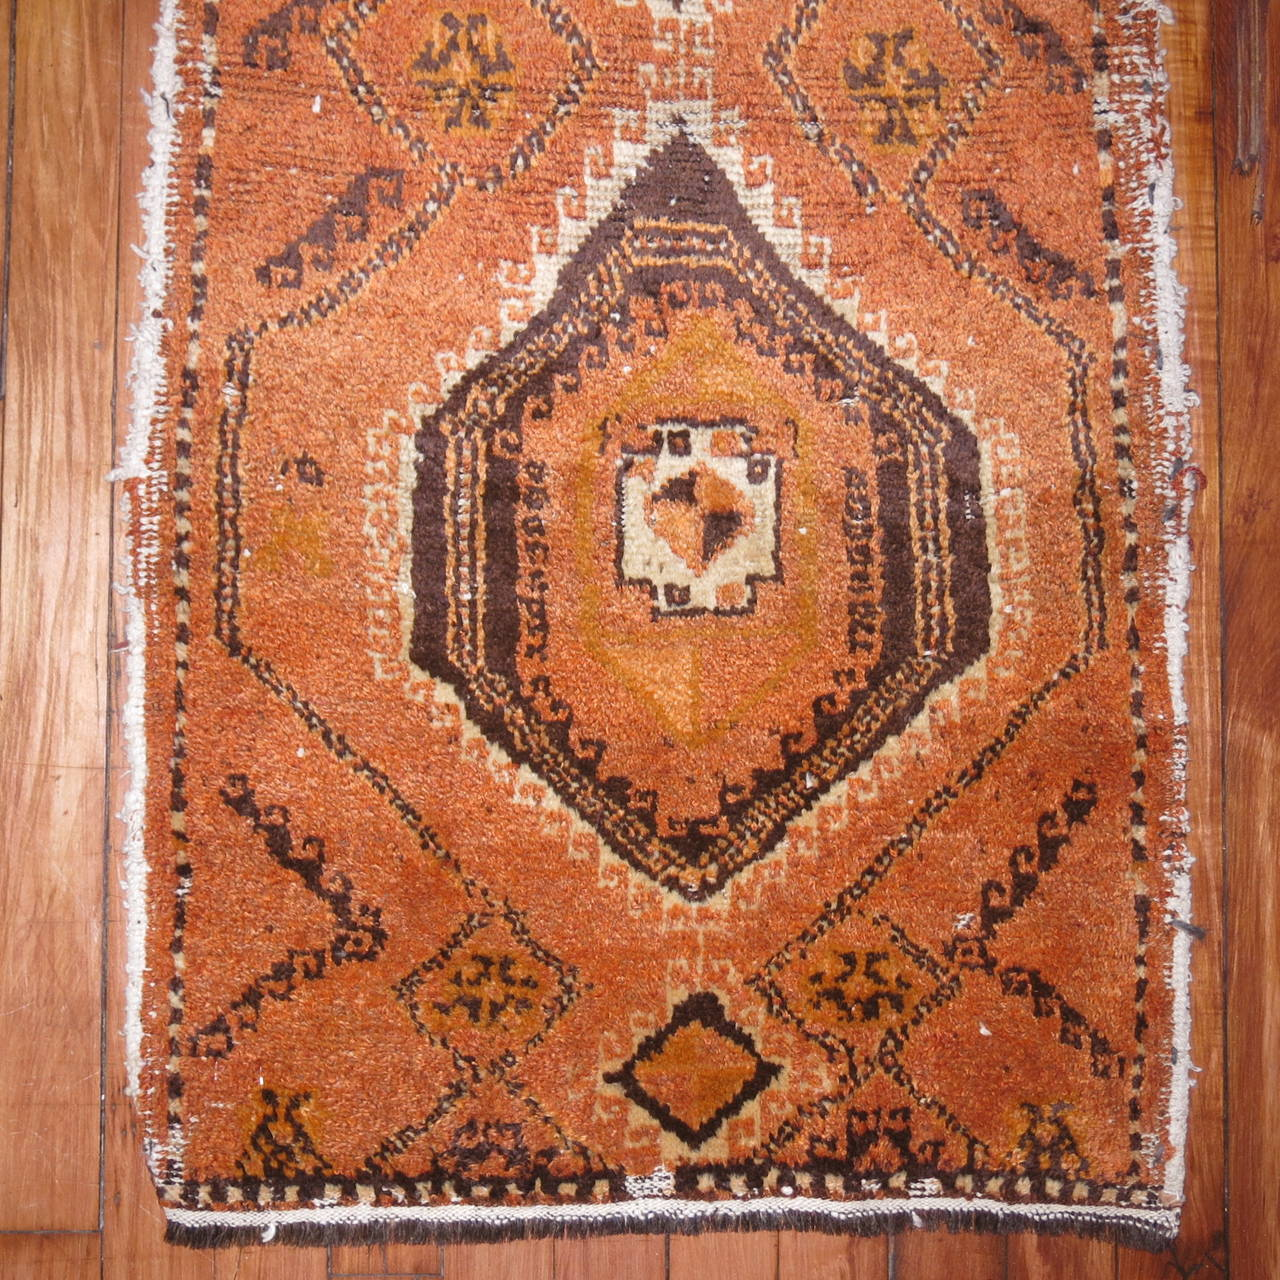 Vintage Throw Rugs: Vintage Moroccan Throw Rug At 1stdibs